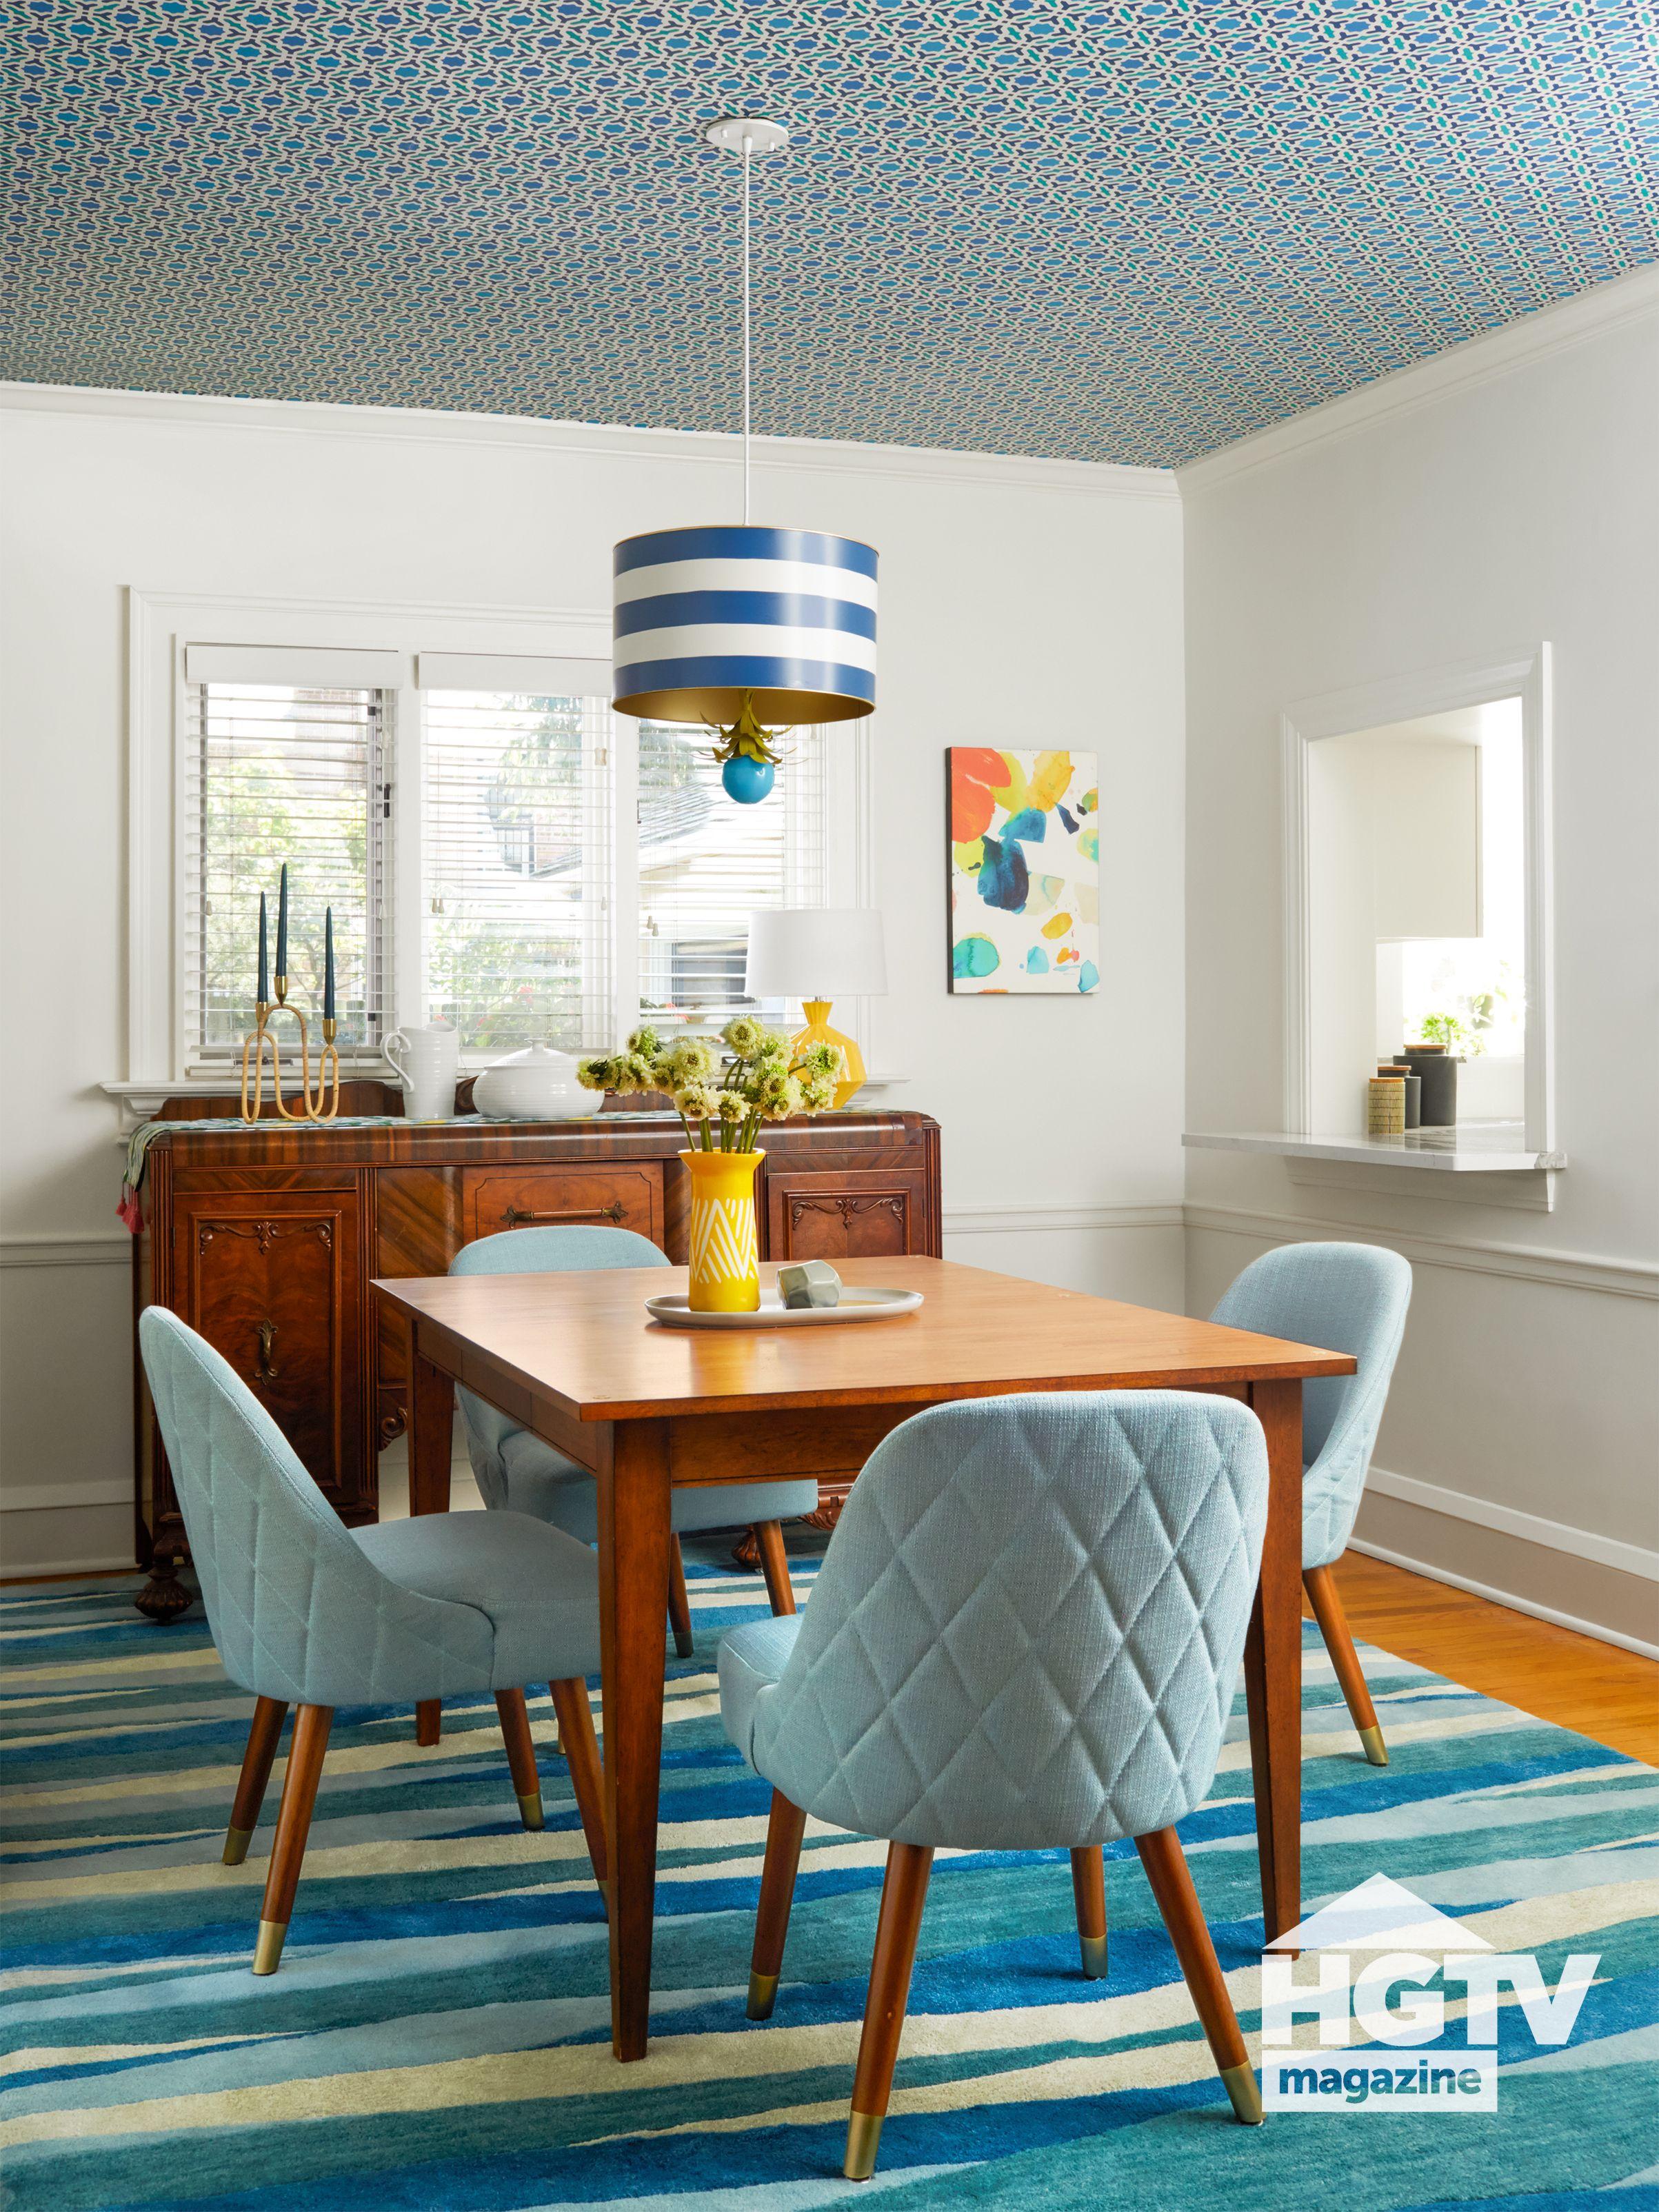 47 Hgtv Dining Rooms Ideas Dining Home Decor Decor